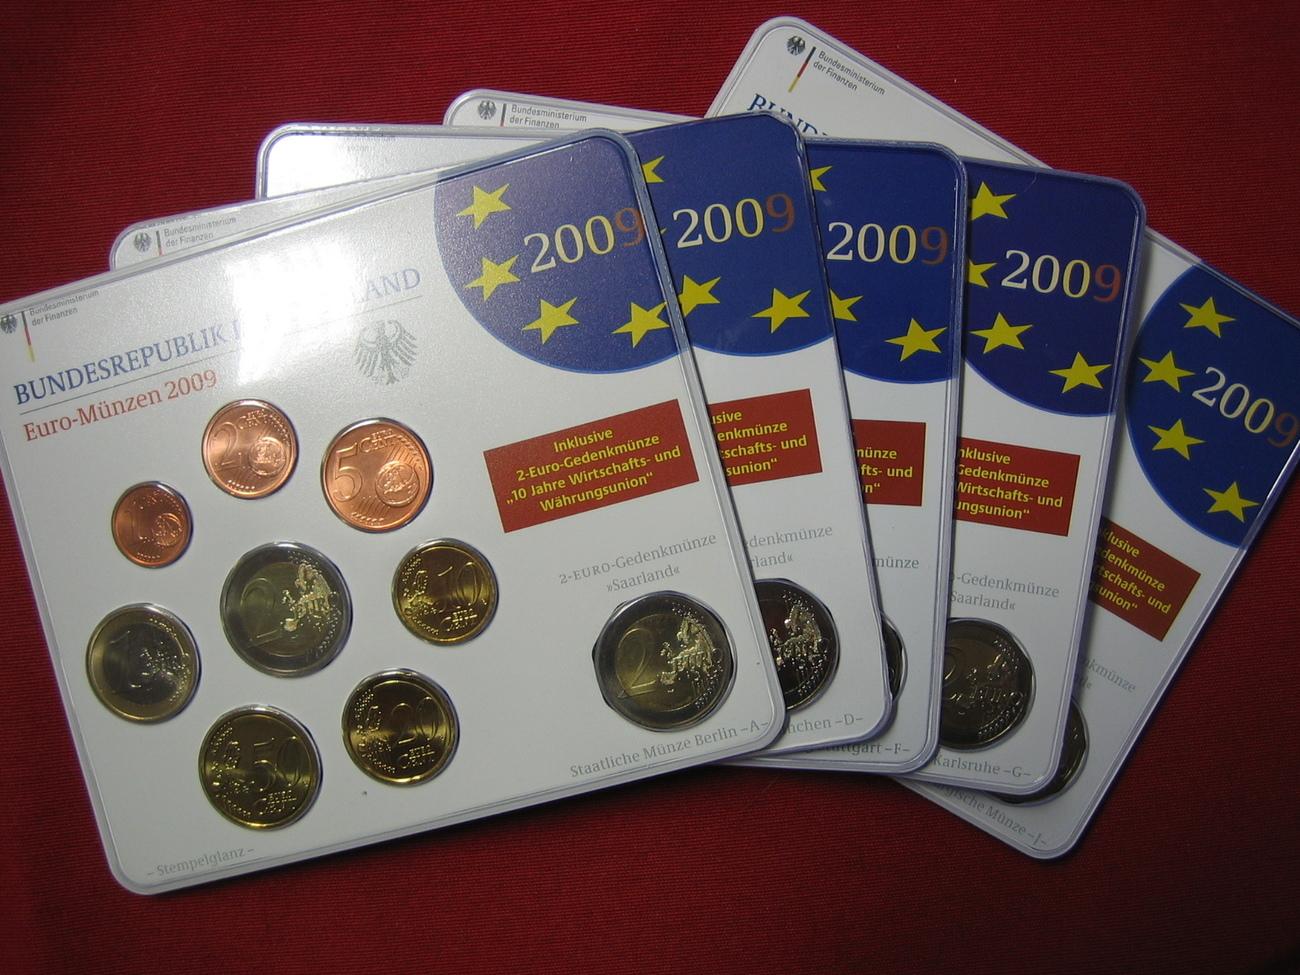 588 2009 Brd Brd Kms 2009 Adfgj Mit 2 Euro Sondermünzen Fdc